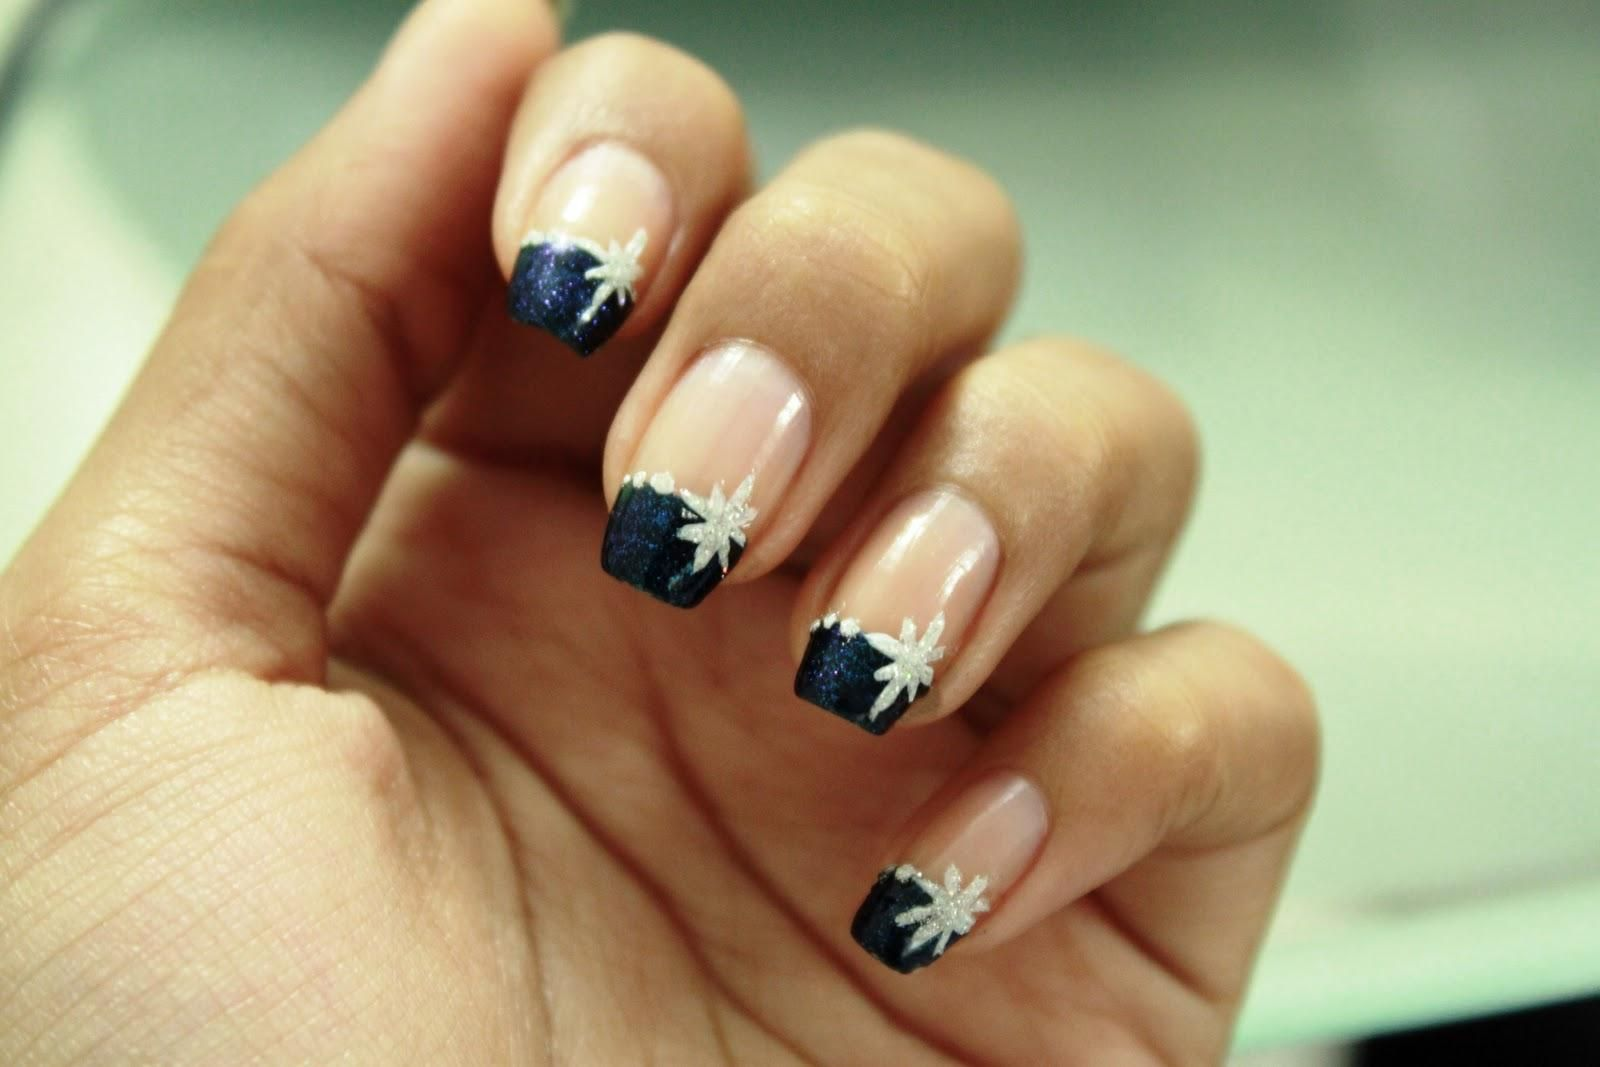 Designer Nail Decals ... | Nail Designs | Pinterest | Designer nails ...